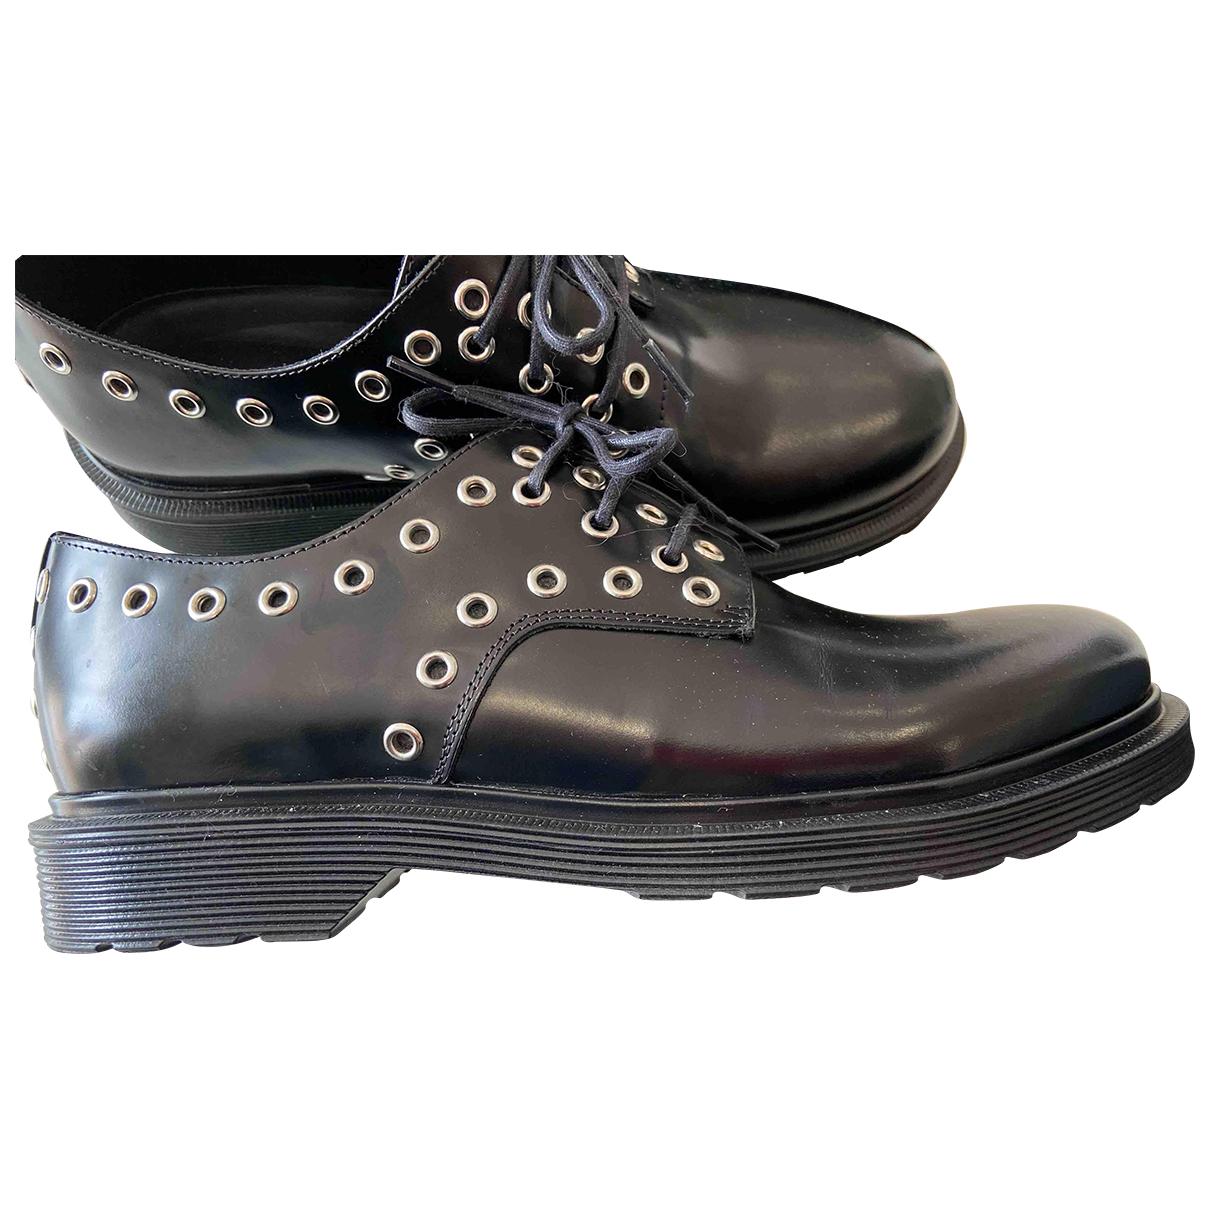 Maje N Black Leather Lace ups for Women 37 EU